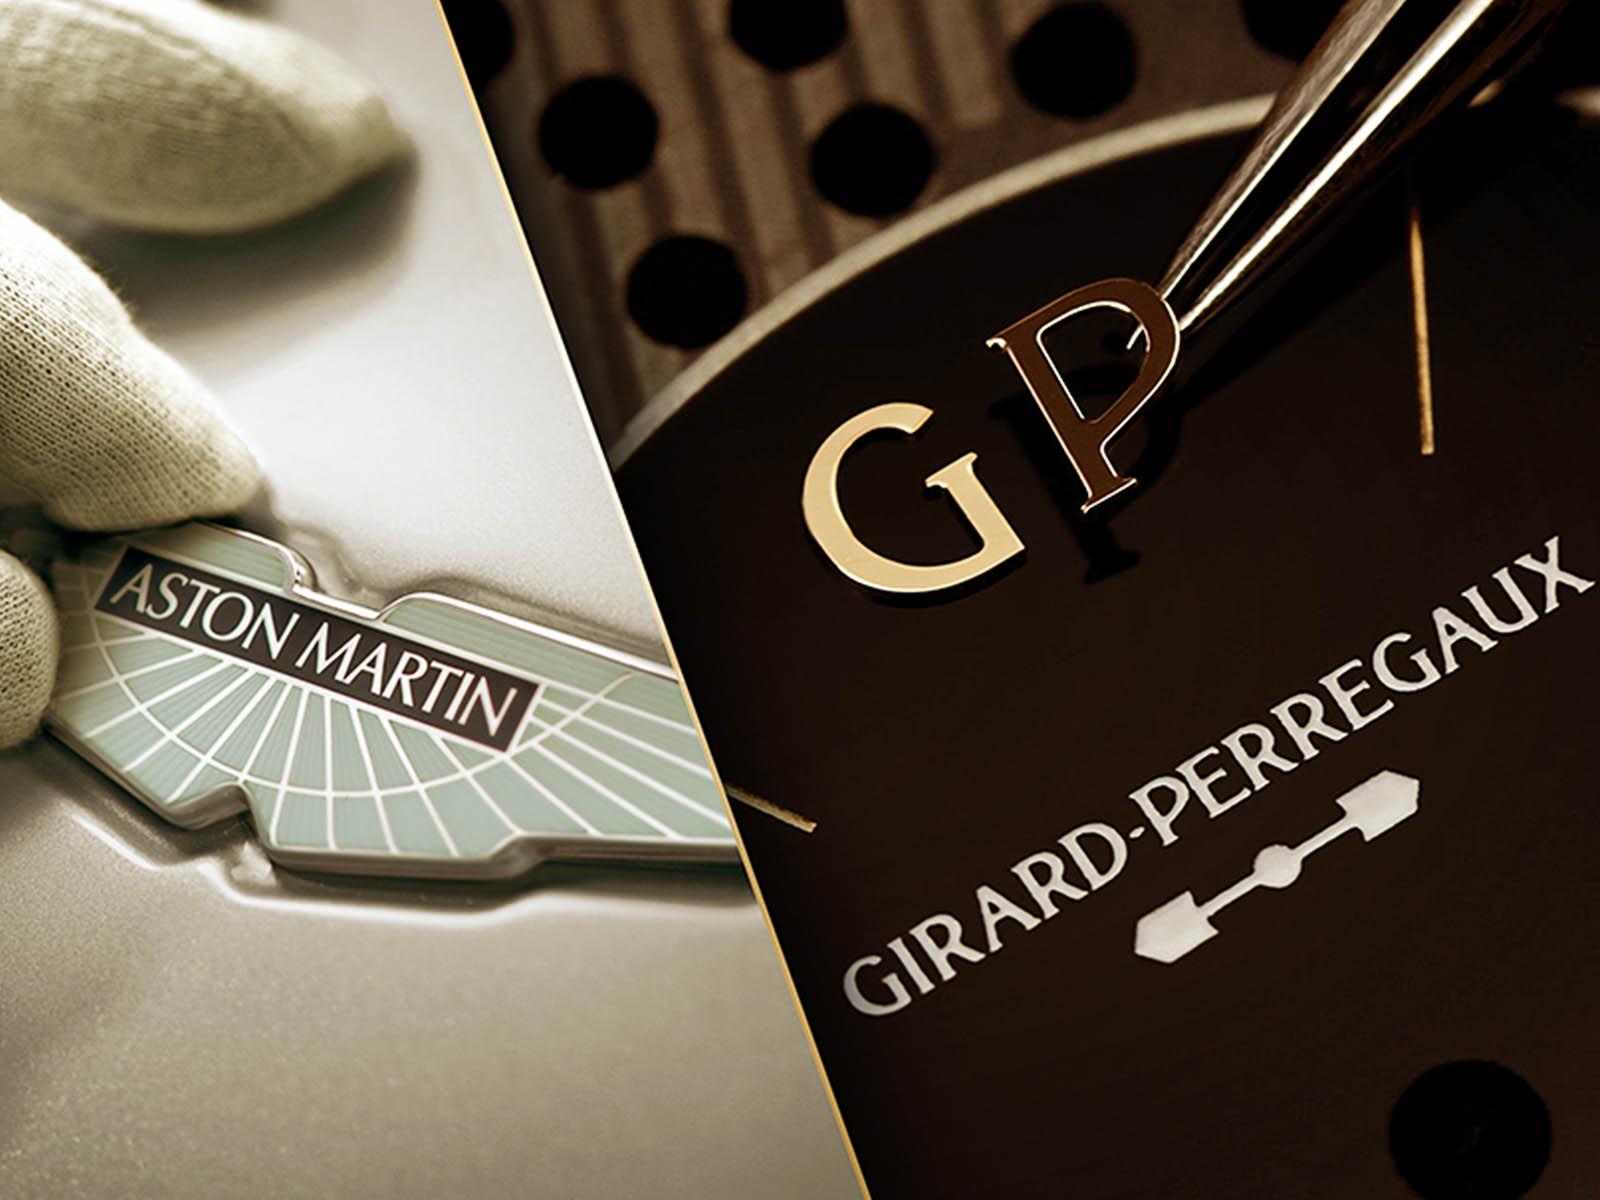 99296-21-001-ba6a-girard-perregaux-tourbillon-three-flying-bridges-aston-martin-3.jpg